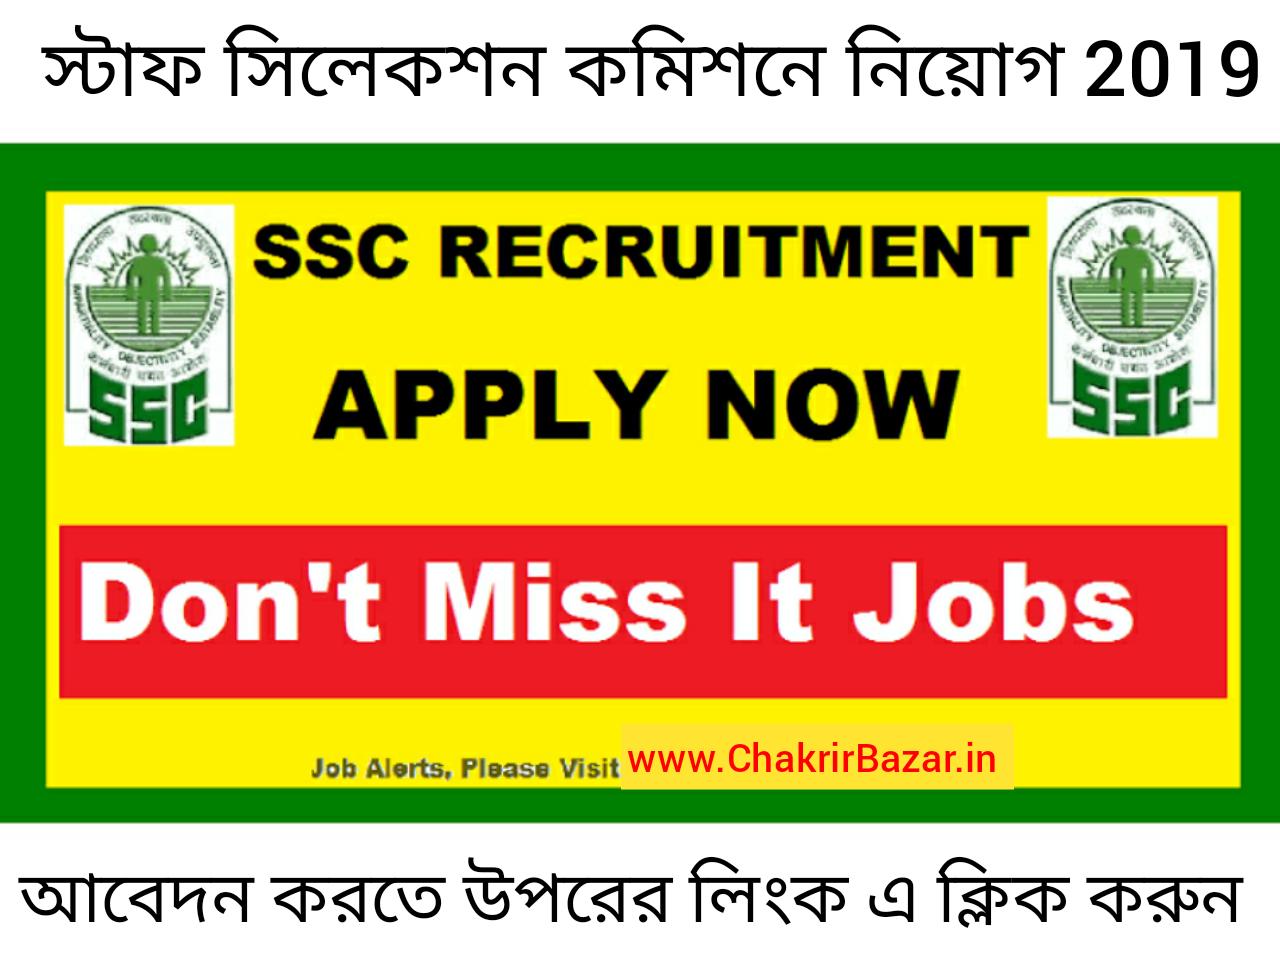 https://www.chakrirbazar.in/2019/06/job-in-madhomik-pass-sallery-25000.html